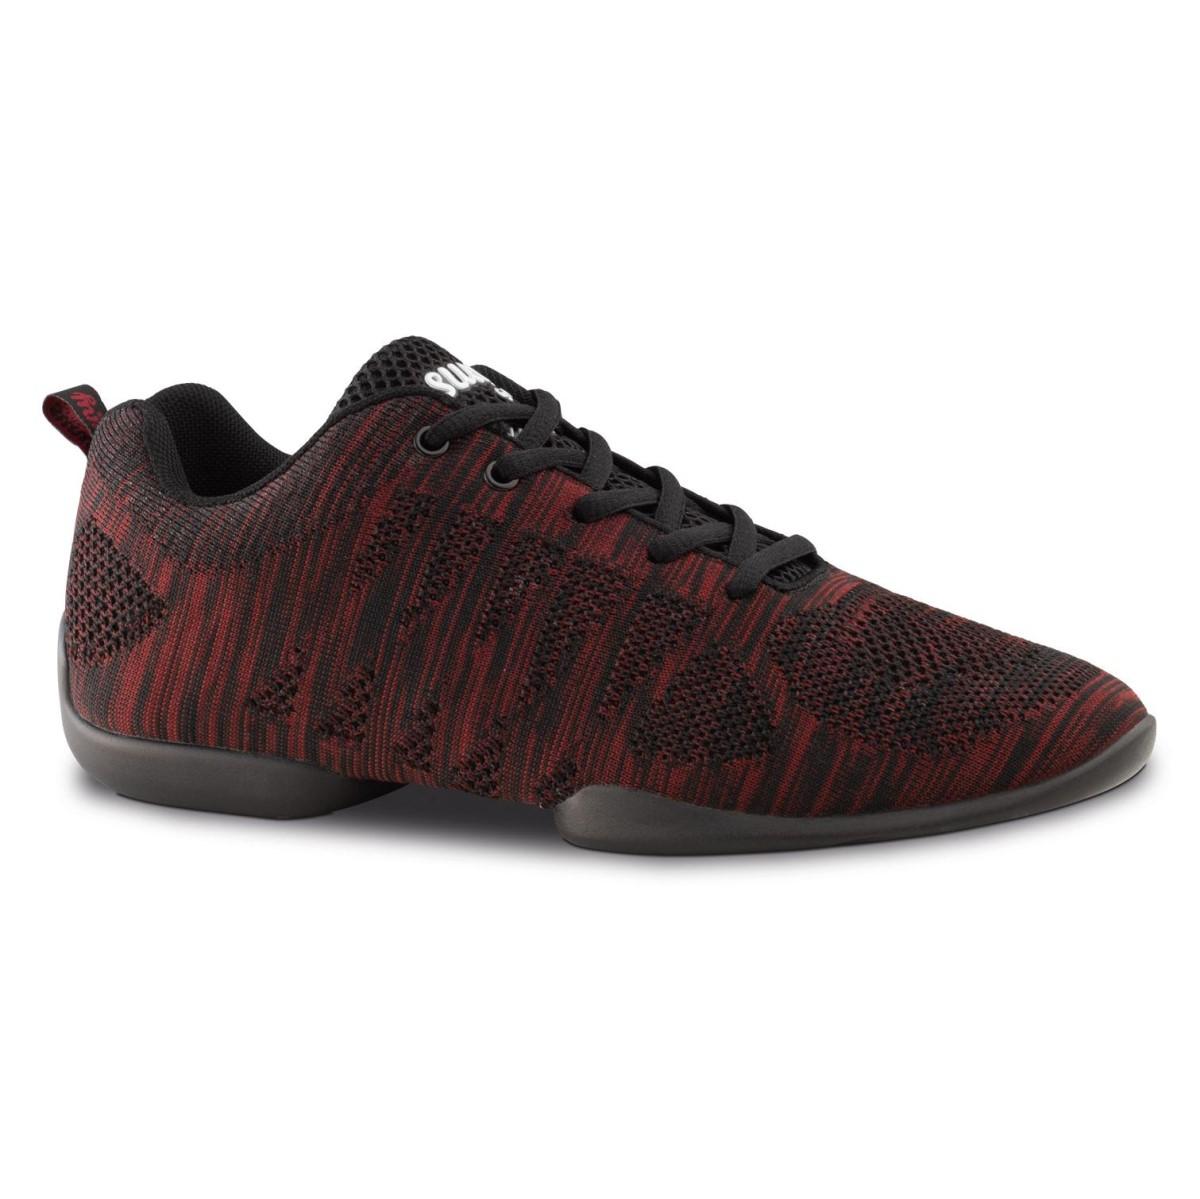 Womens Sneakers 135 Bold Dance Redblack Anna Kern 7qwHf5